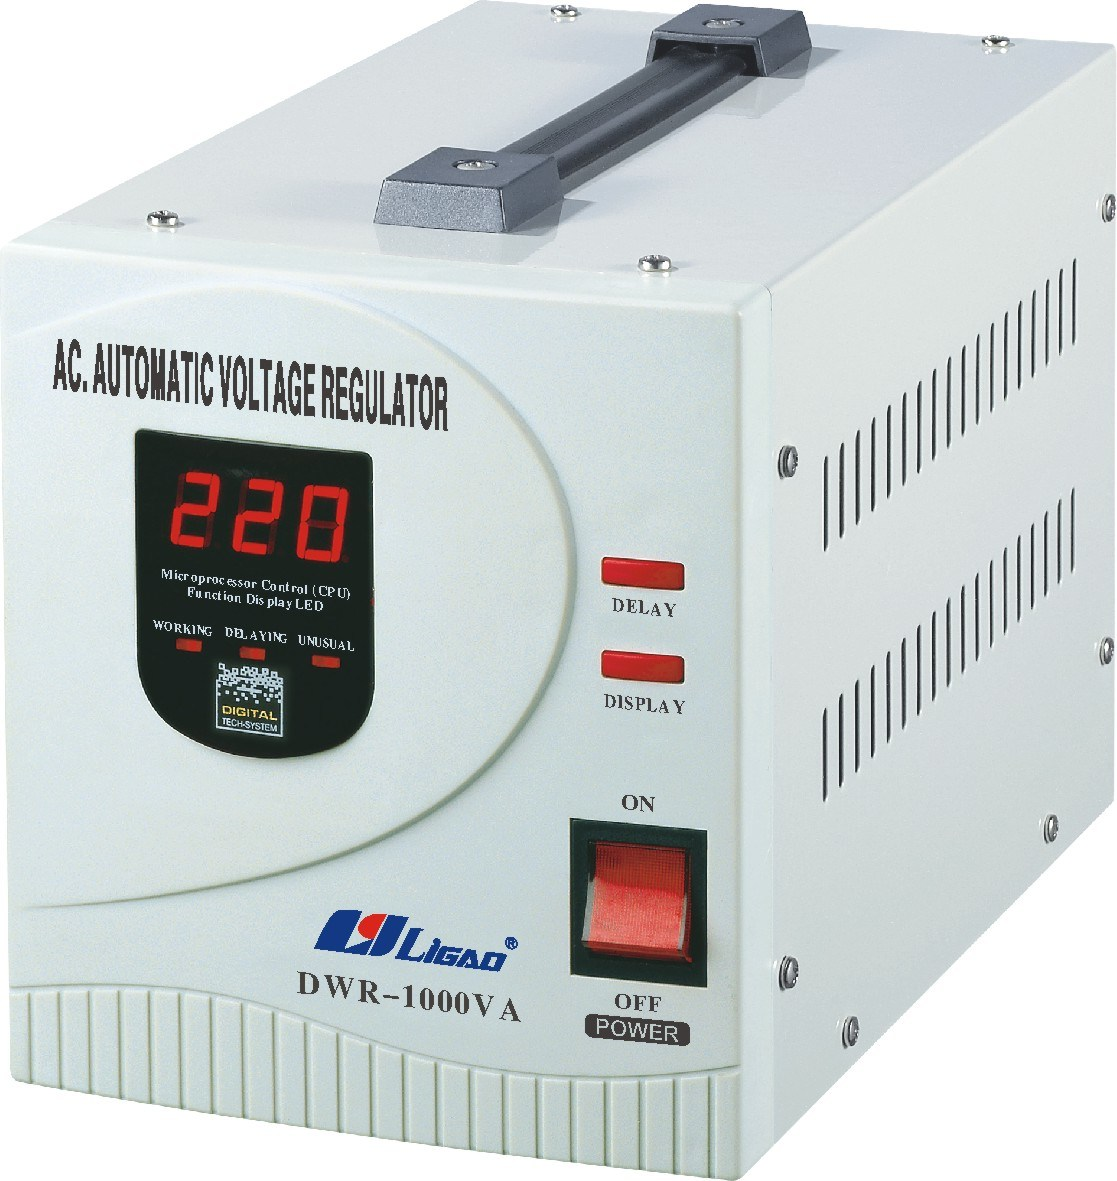 China Automatic Voltage Regulator  Dwr-1000va